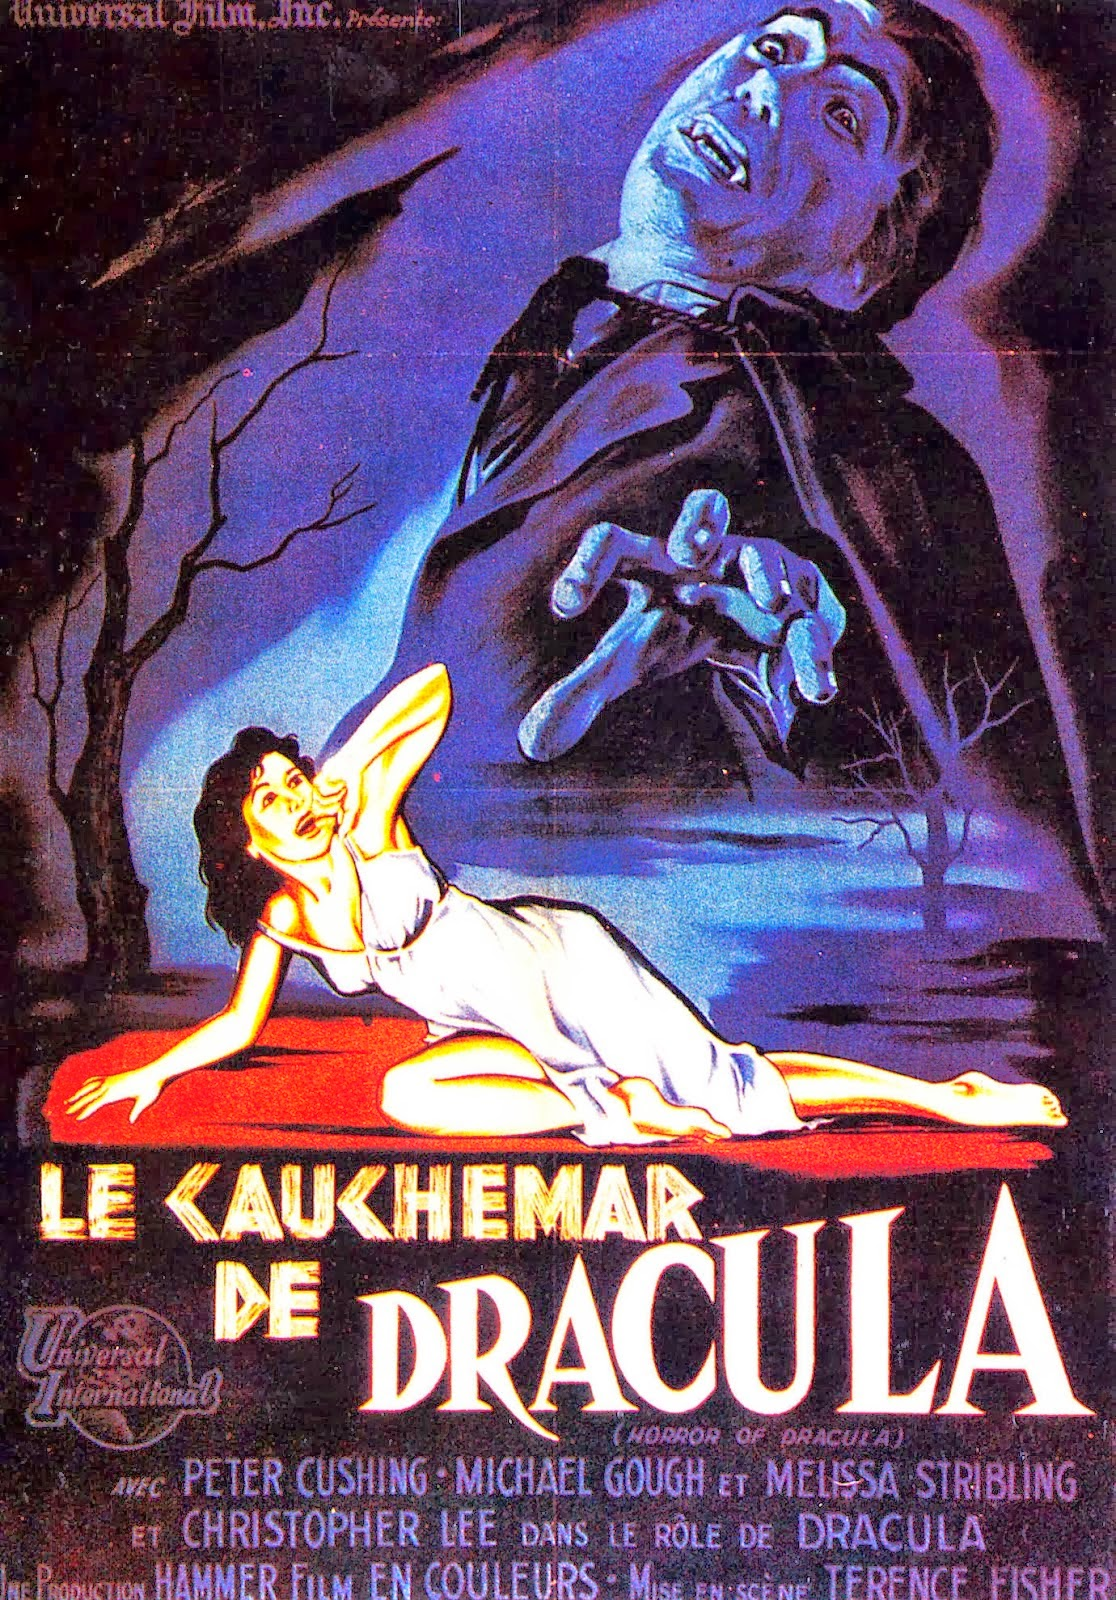 Cauchemar de Dracula (le)